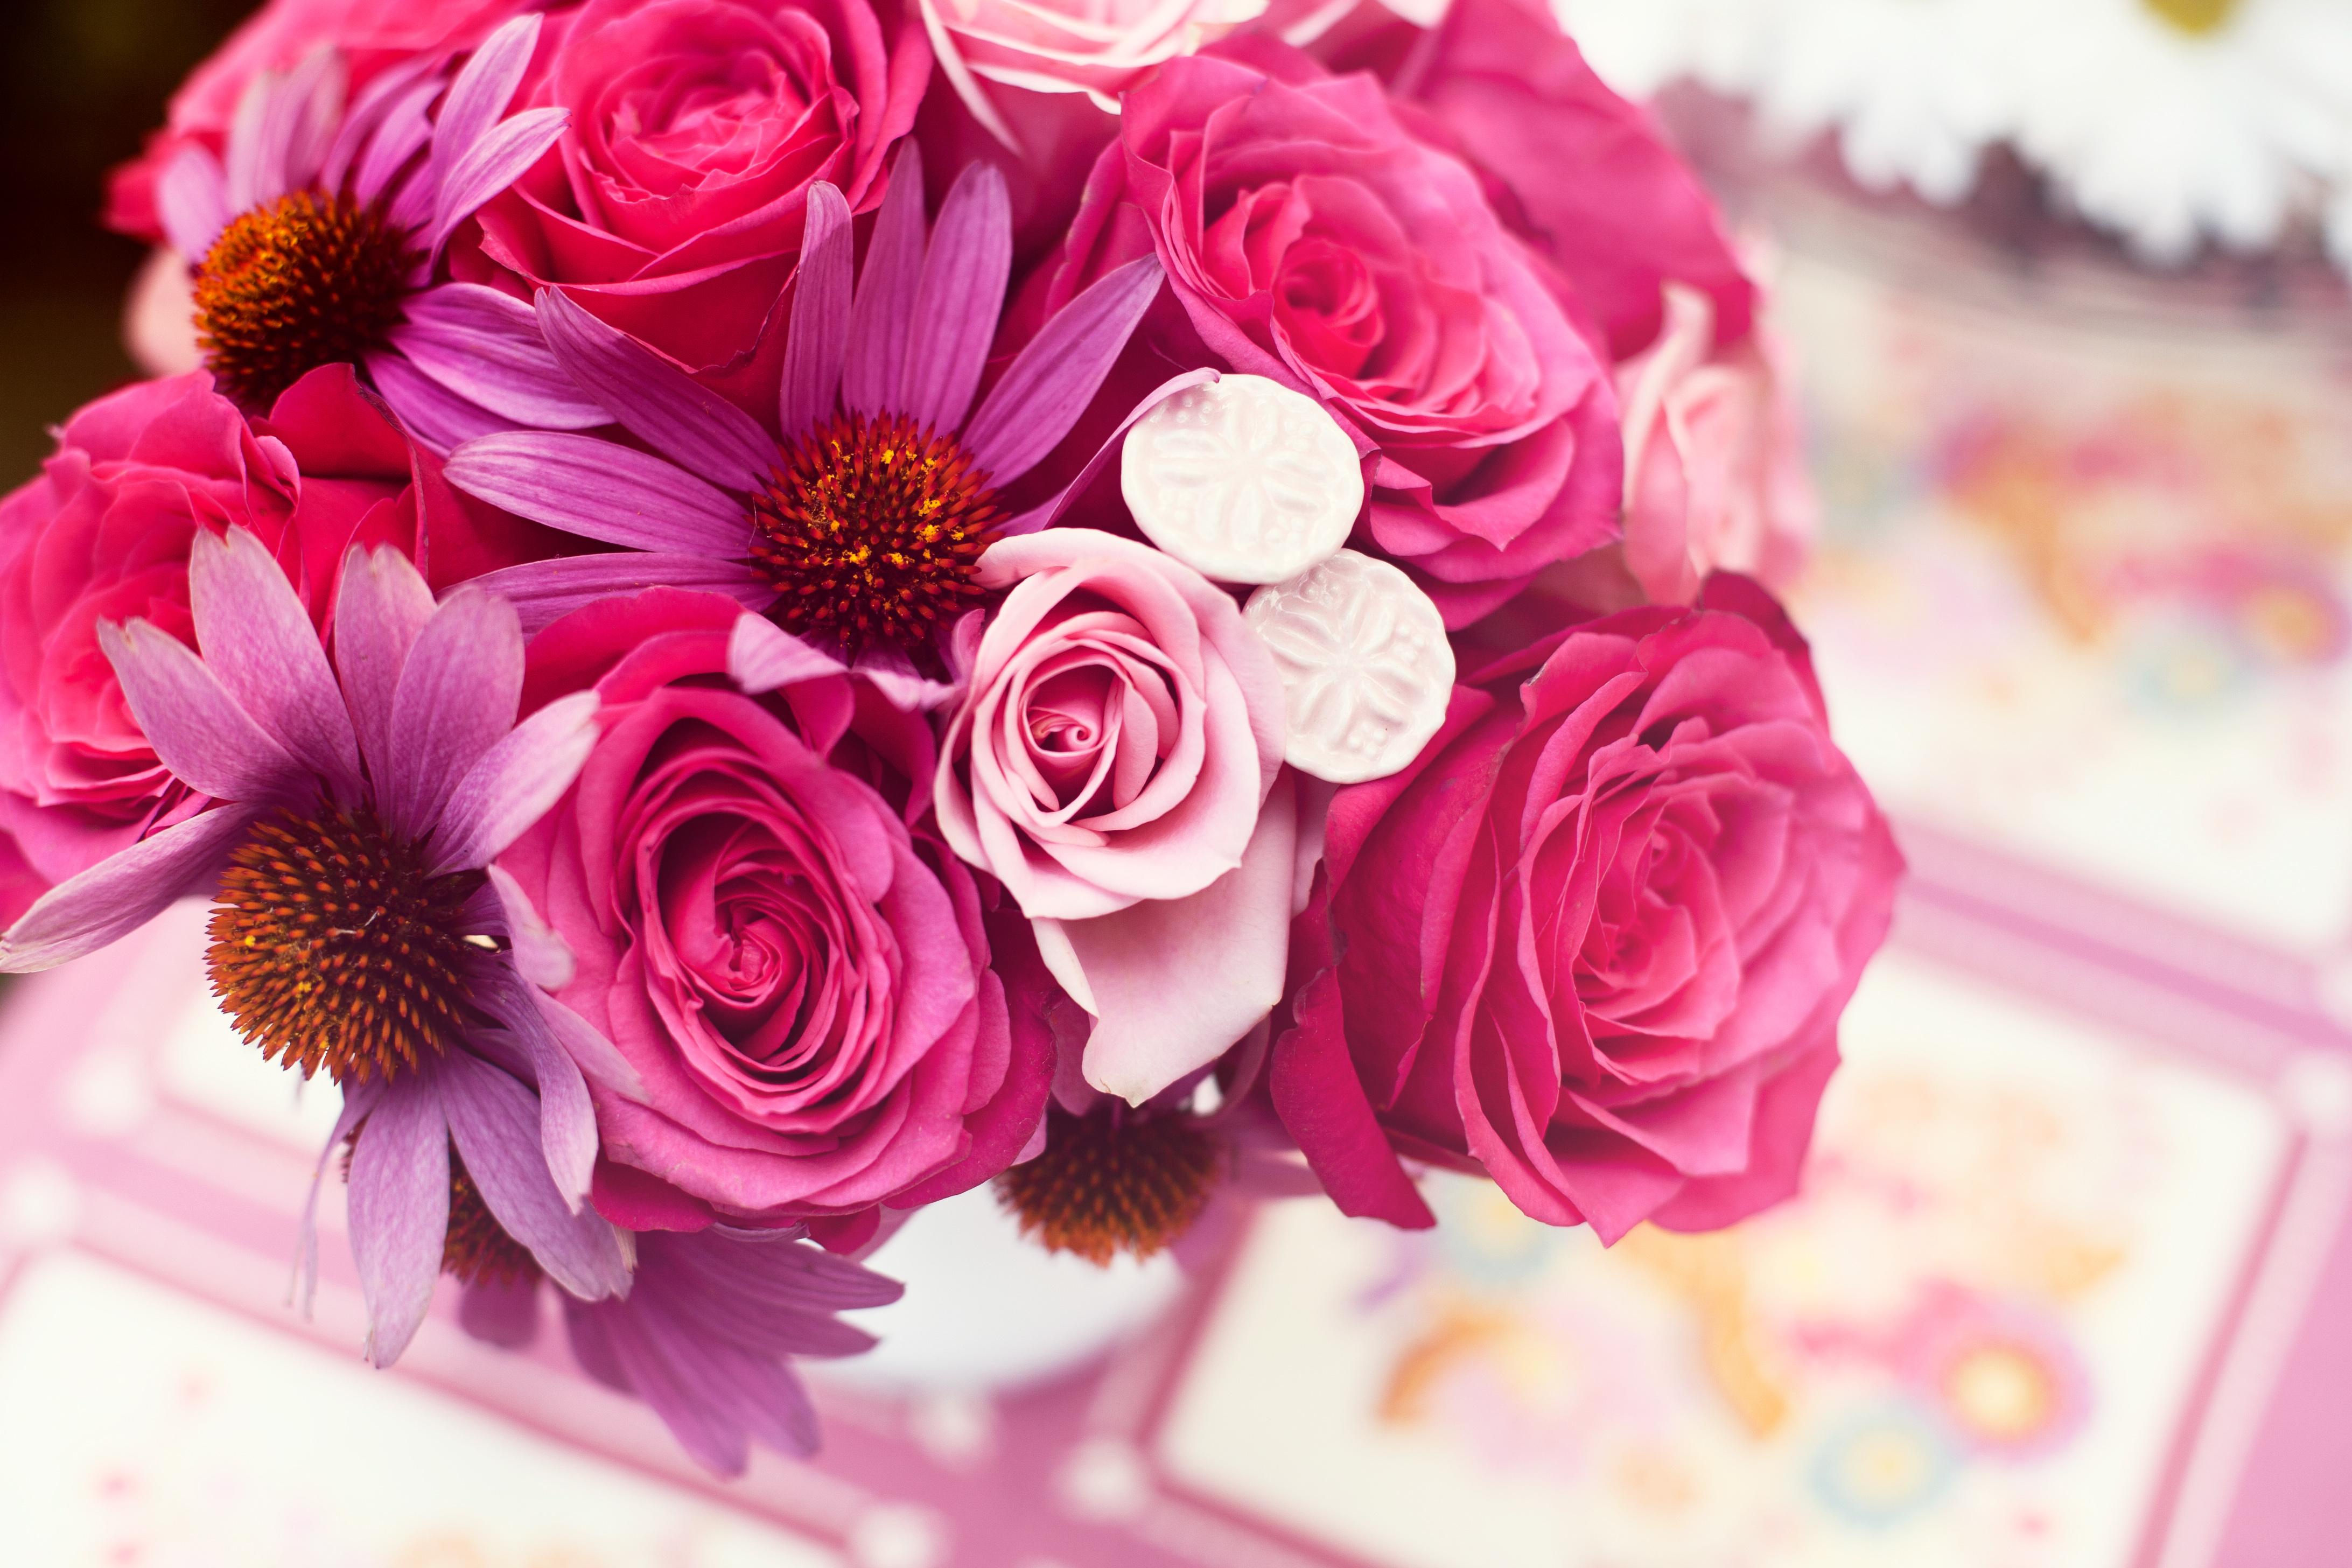 http://images6.fanpop.com/image/photos/33200000/Pink-Flowers-flowers-33223281-4368-2912.jpg